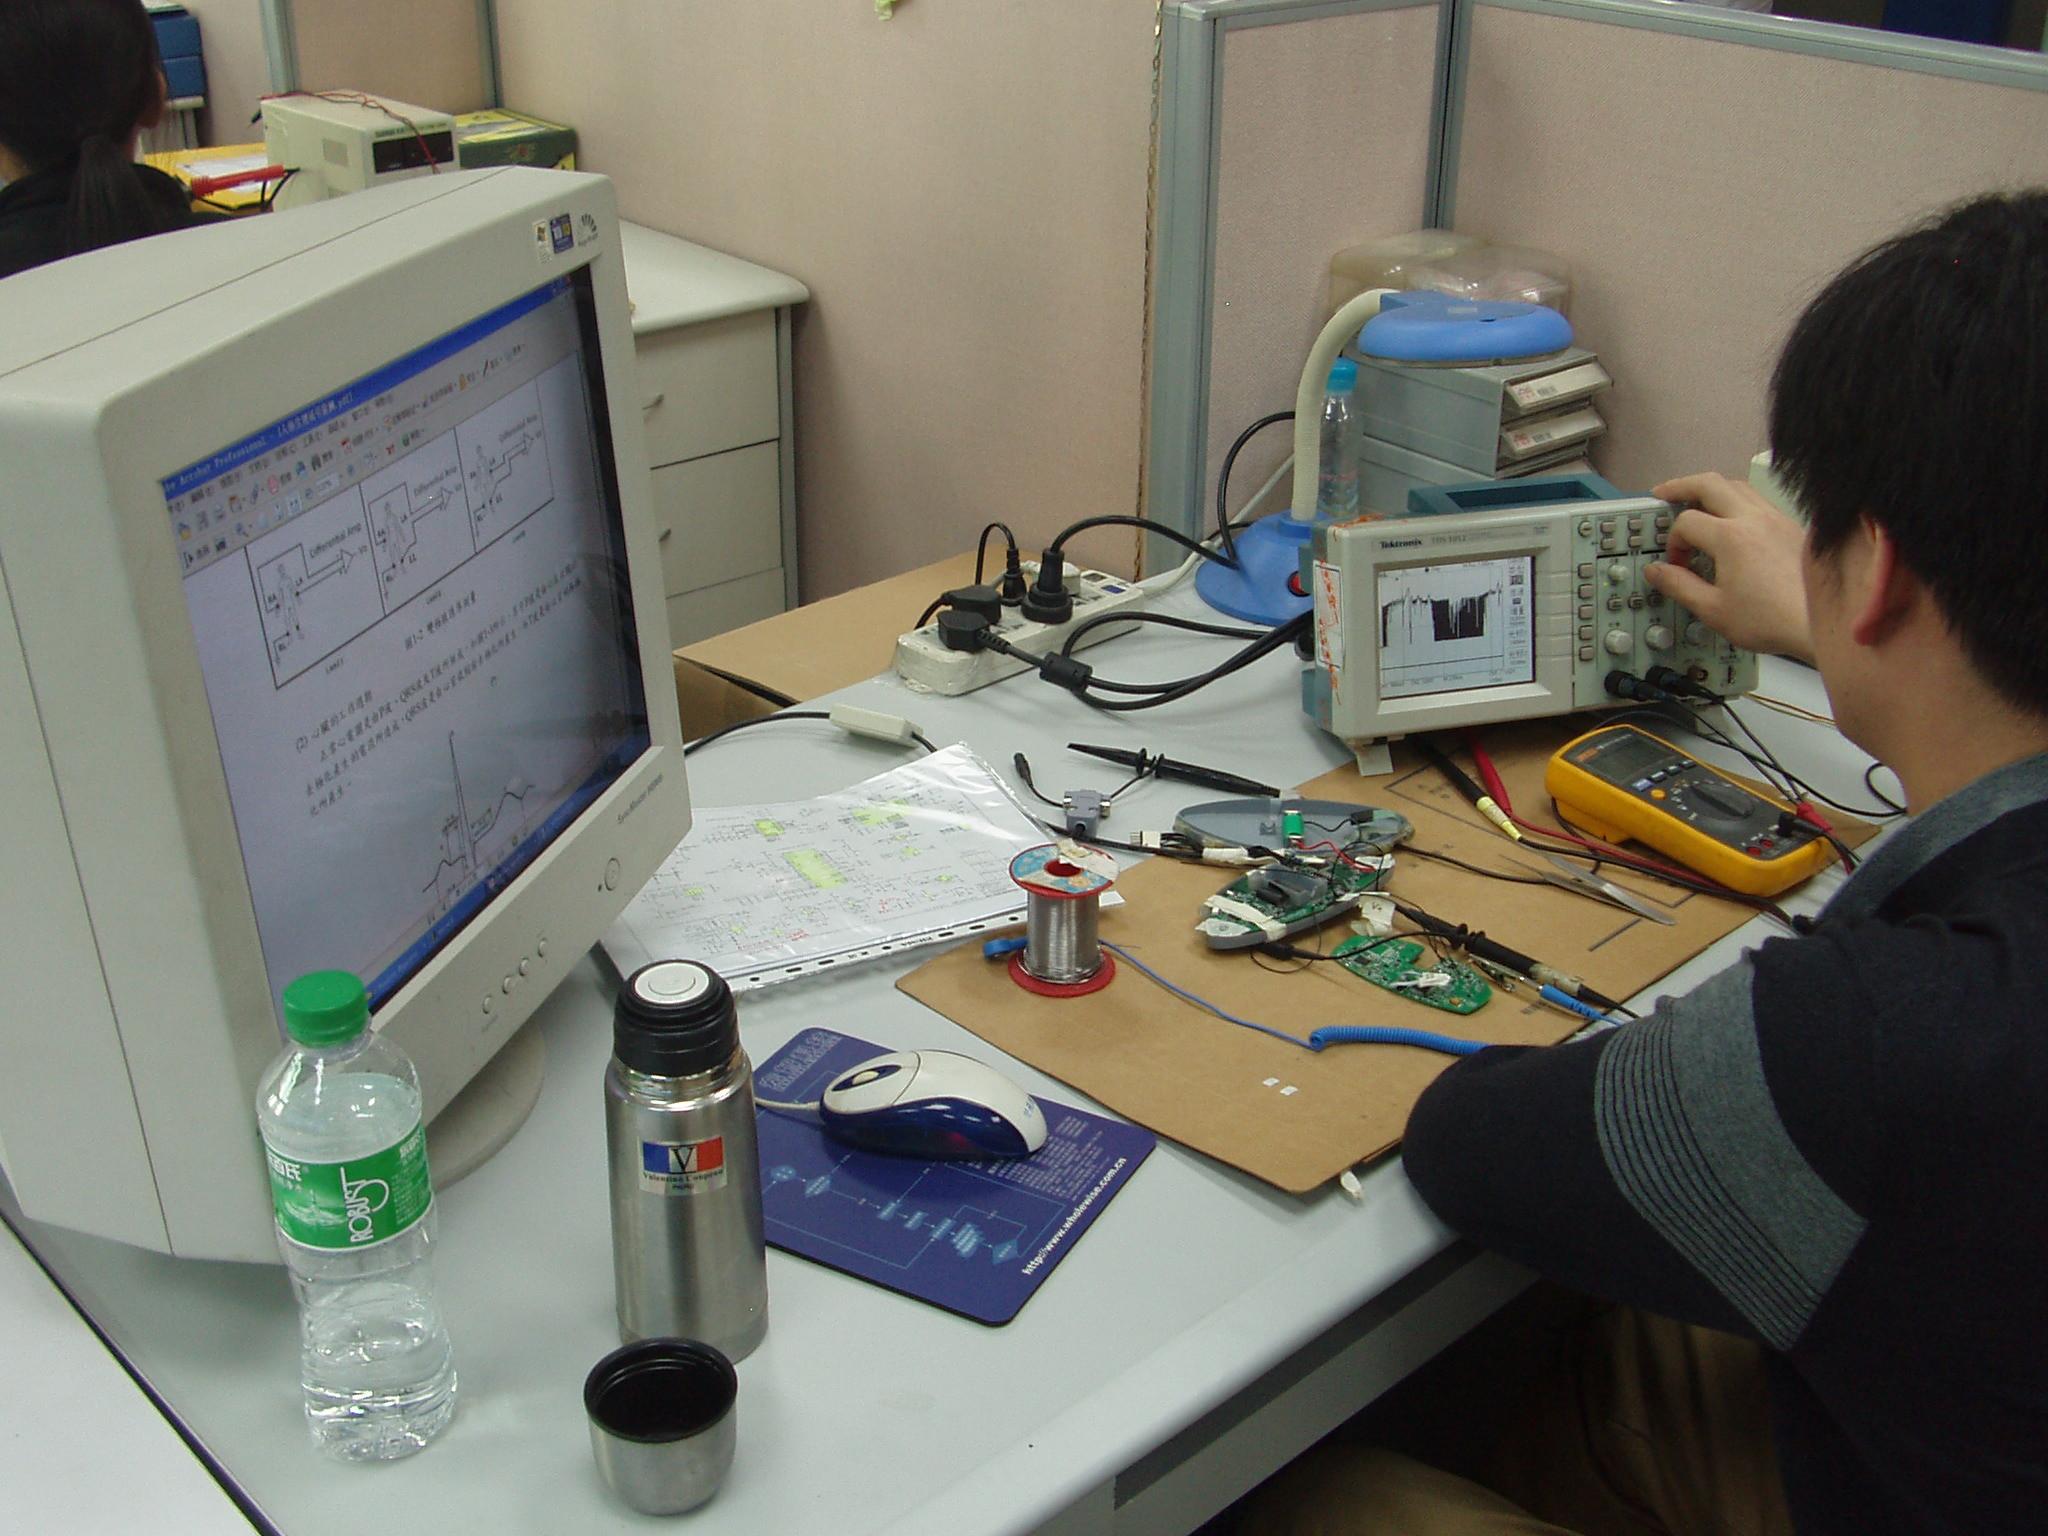 PCB Cad Layout